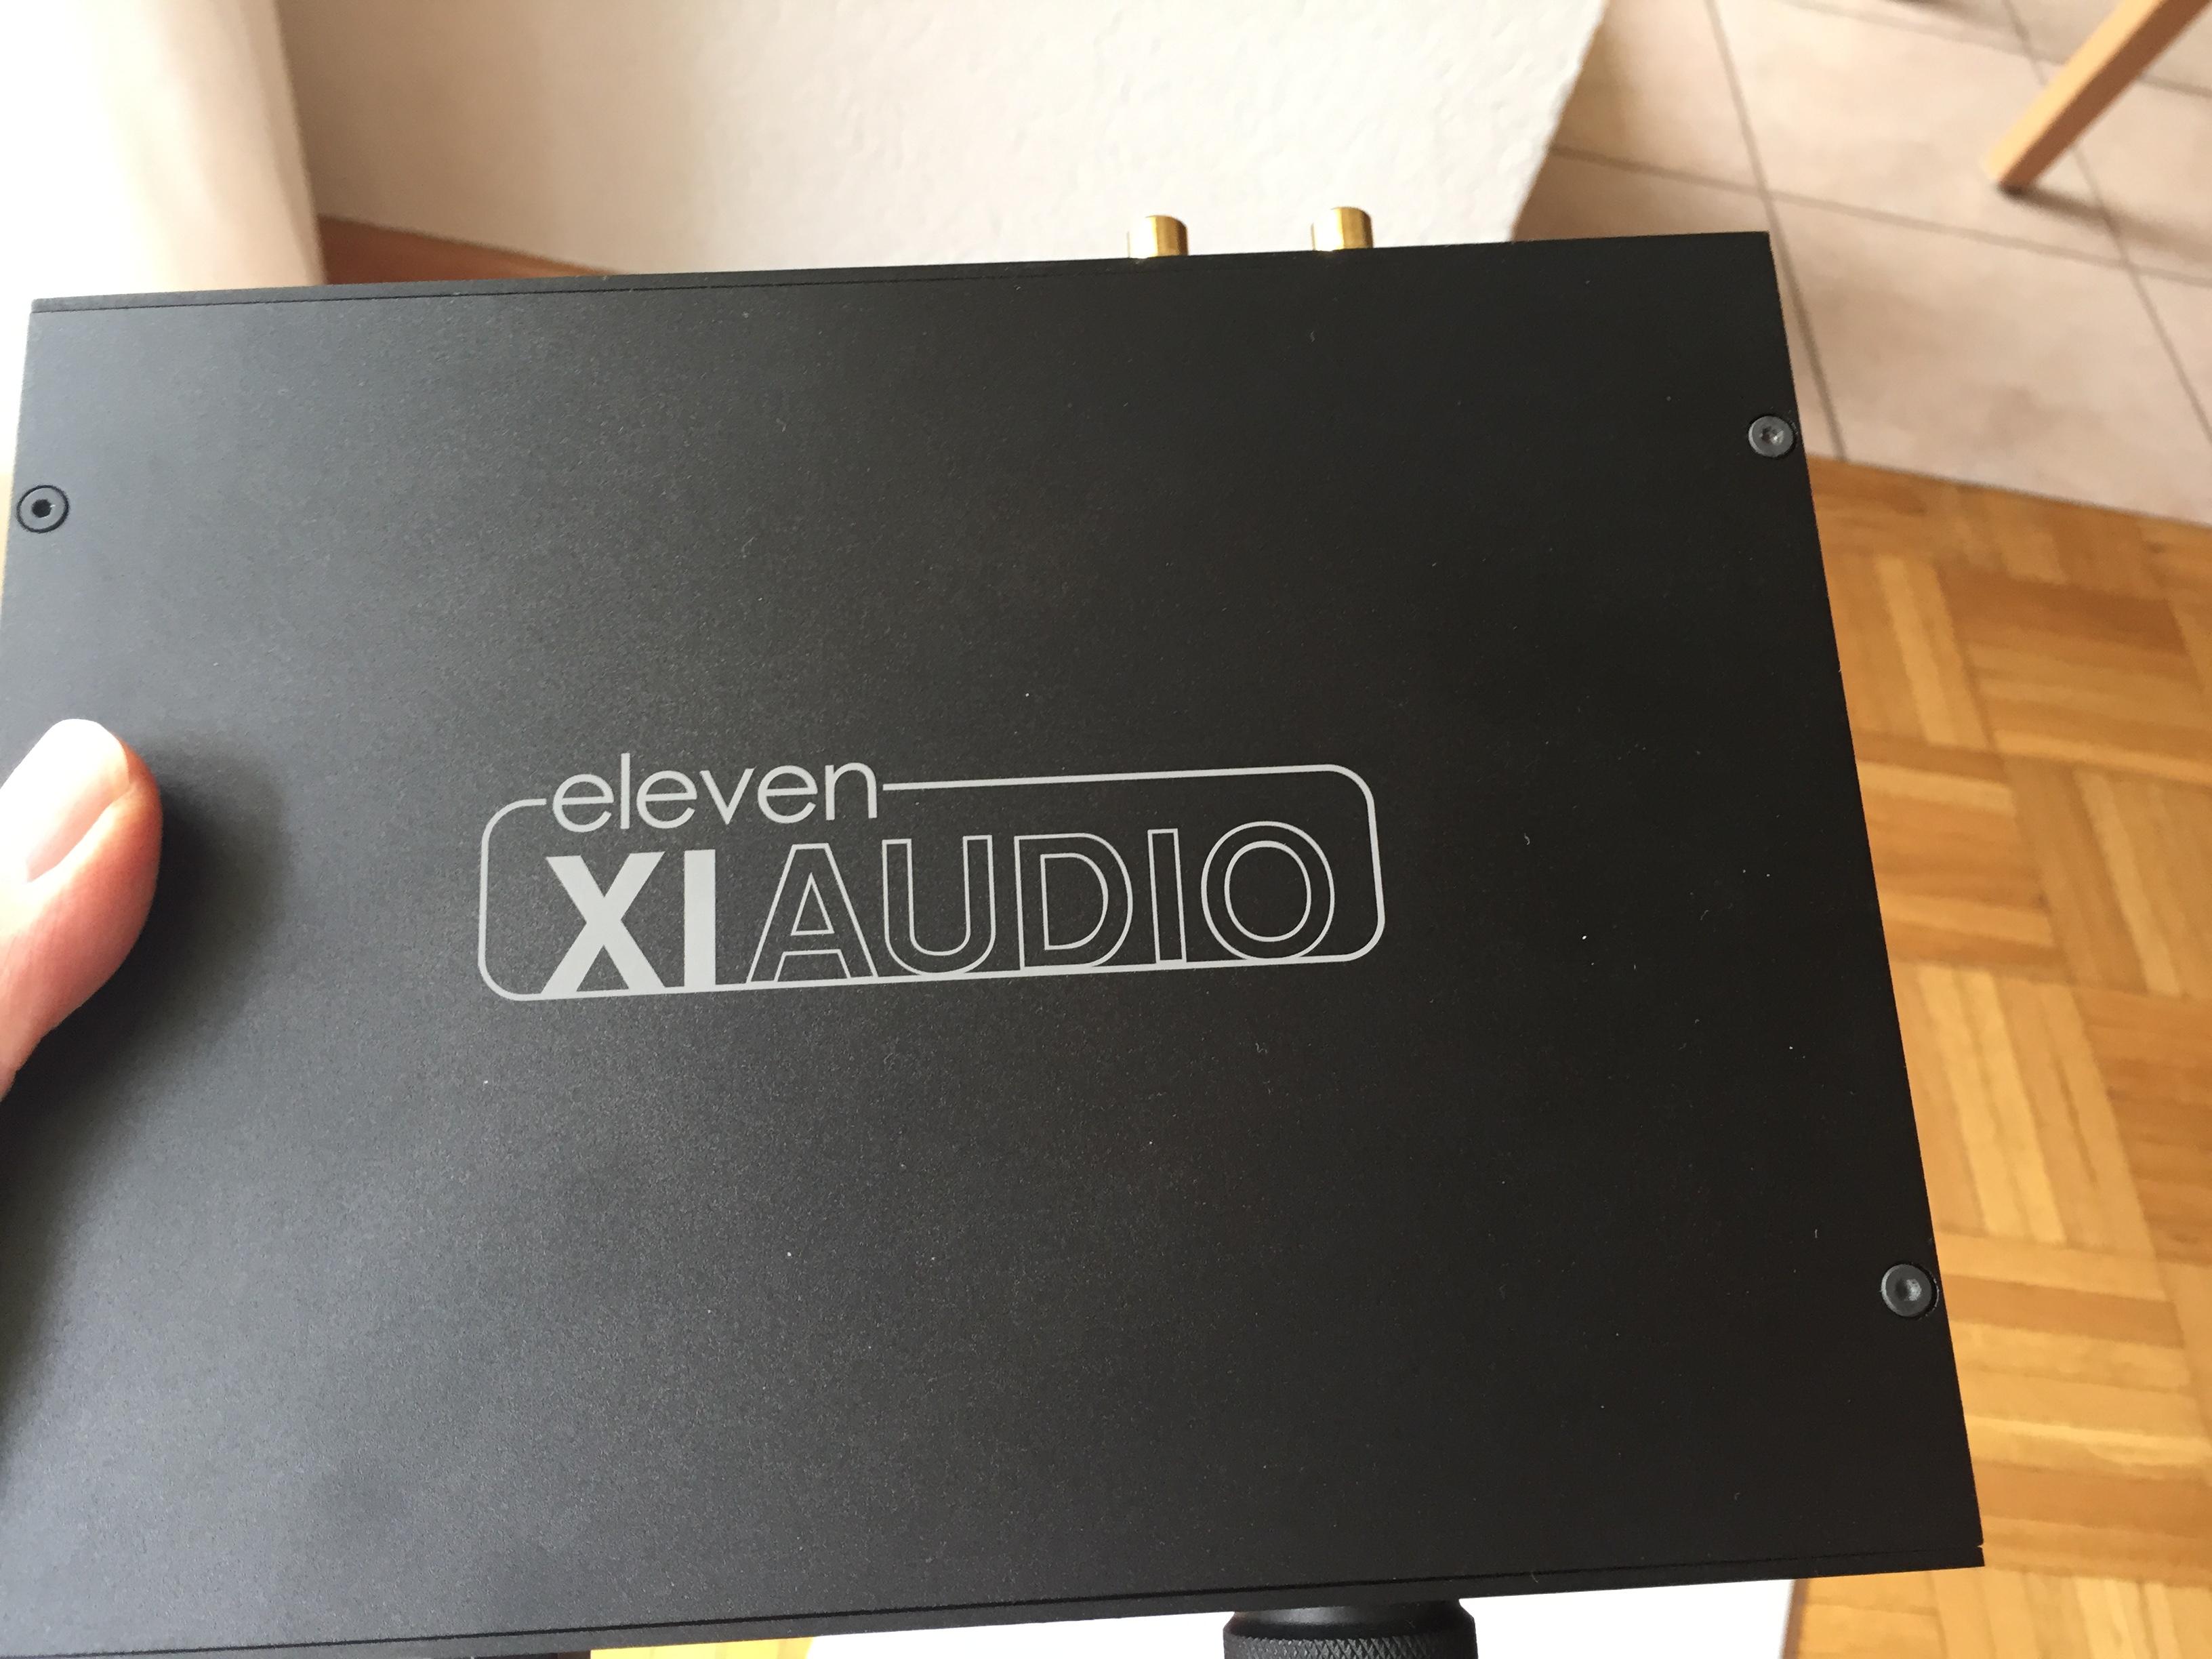 WITHDRAWN] XIAUDIO / Eleven Audio Broadway S like new